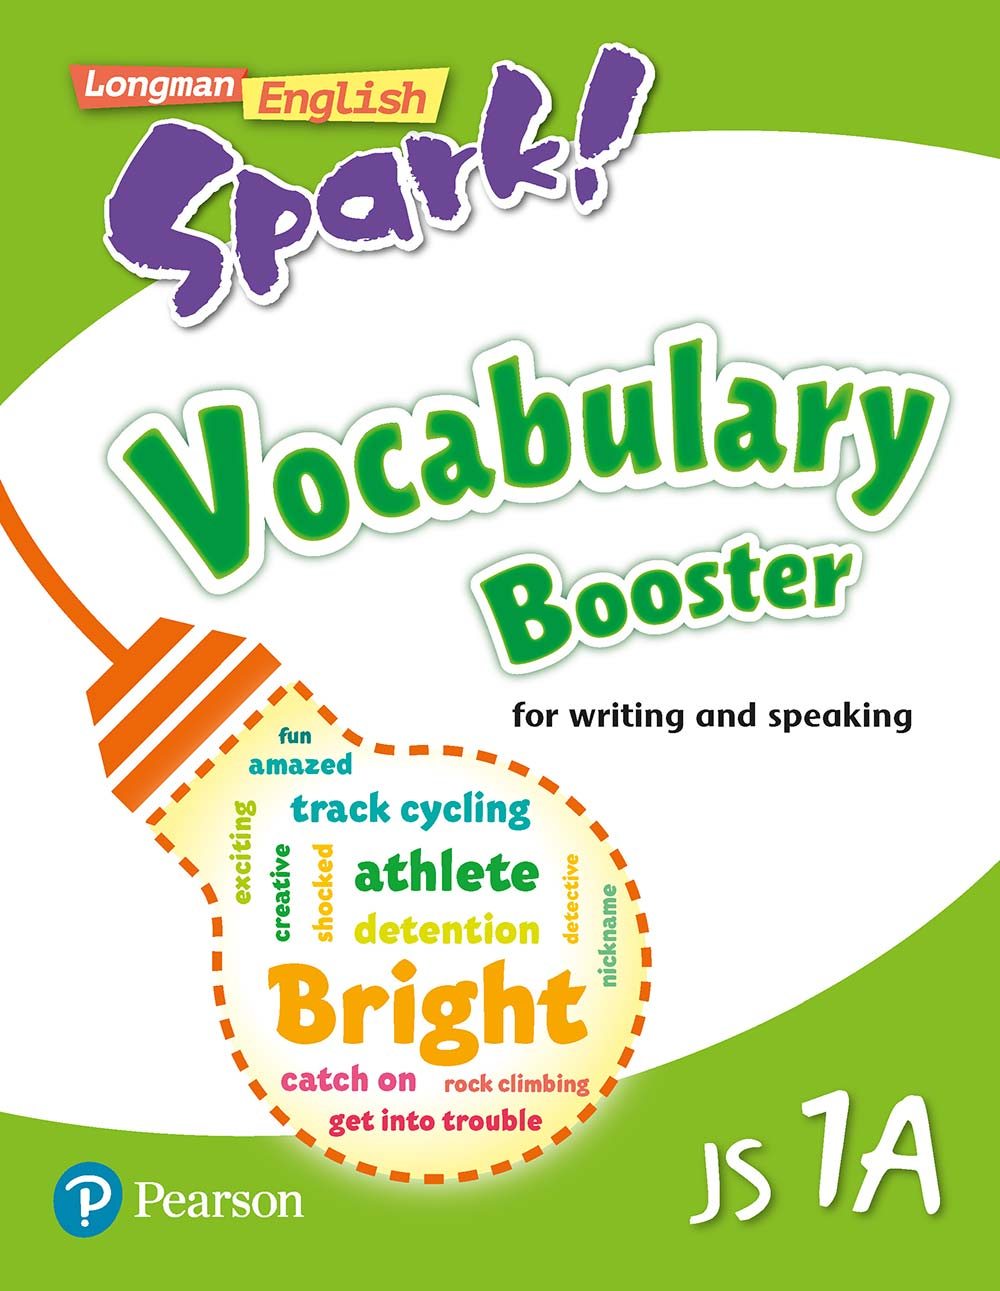 Longman English Spark! JS1A Vocabulary Booster